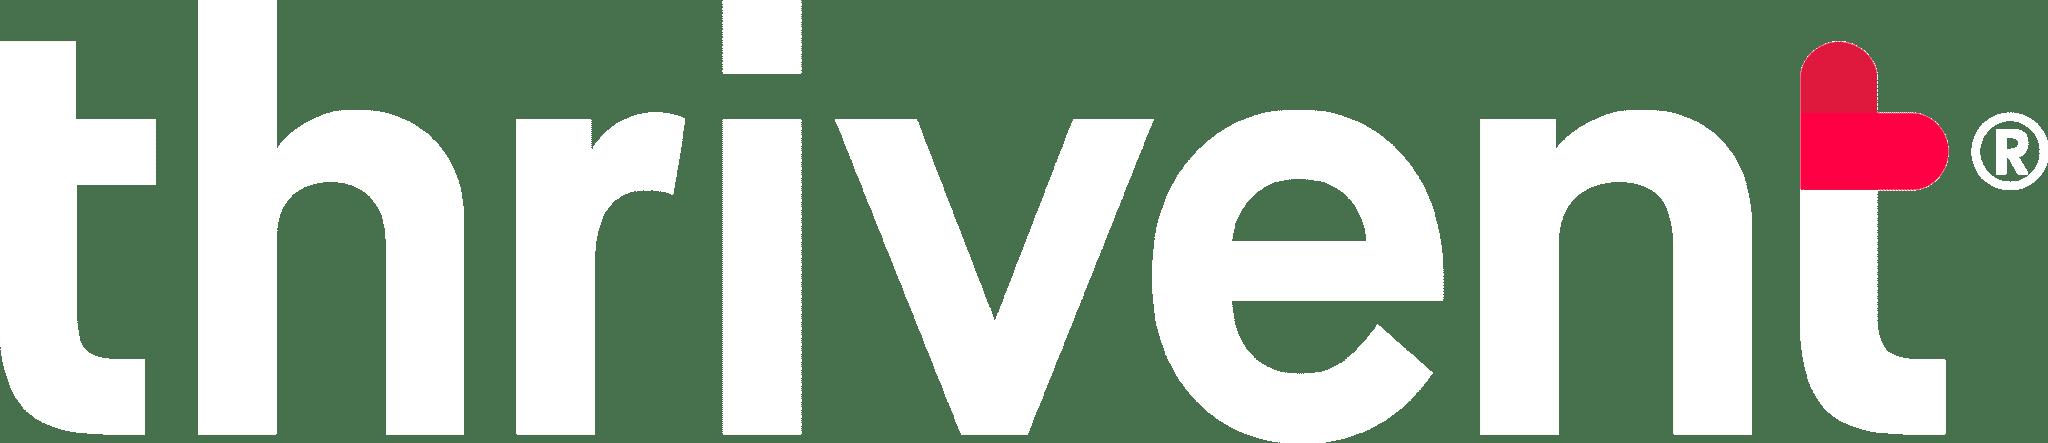 thrivent_logo-white